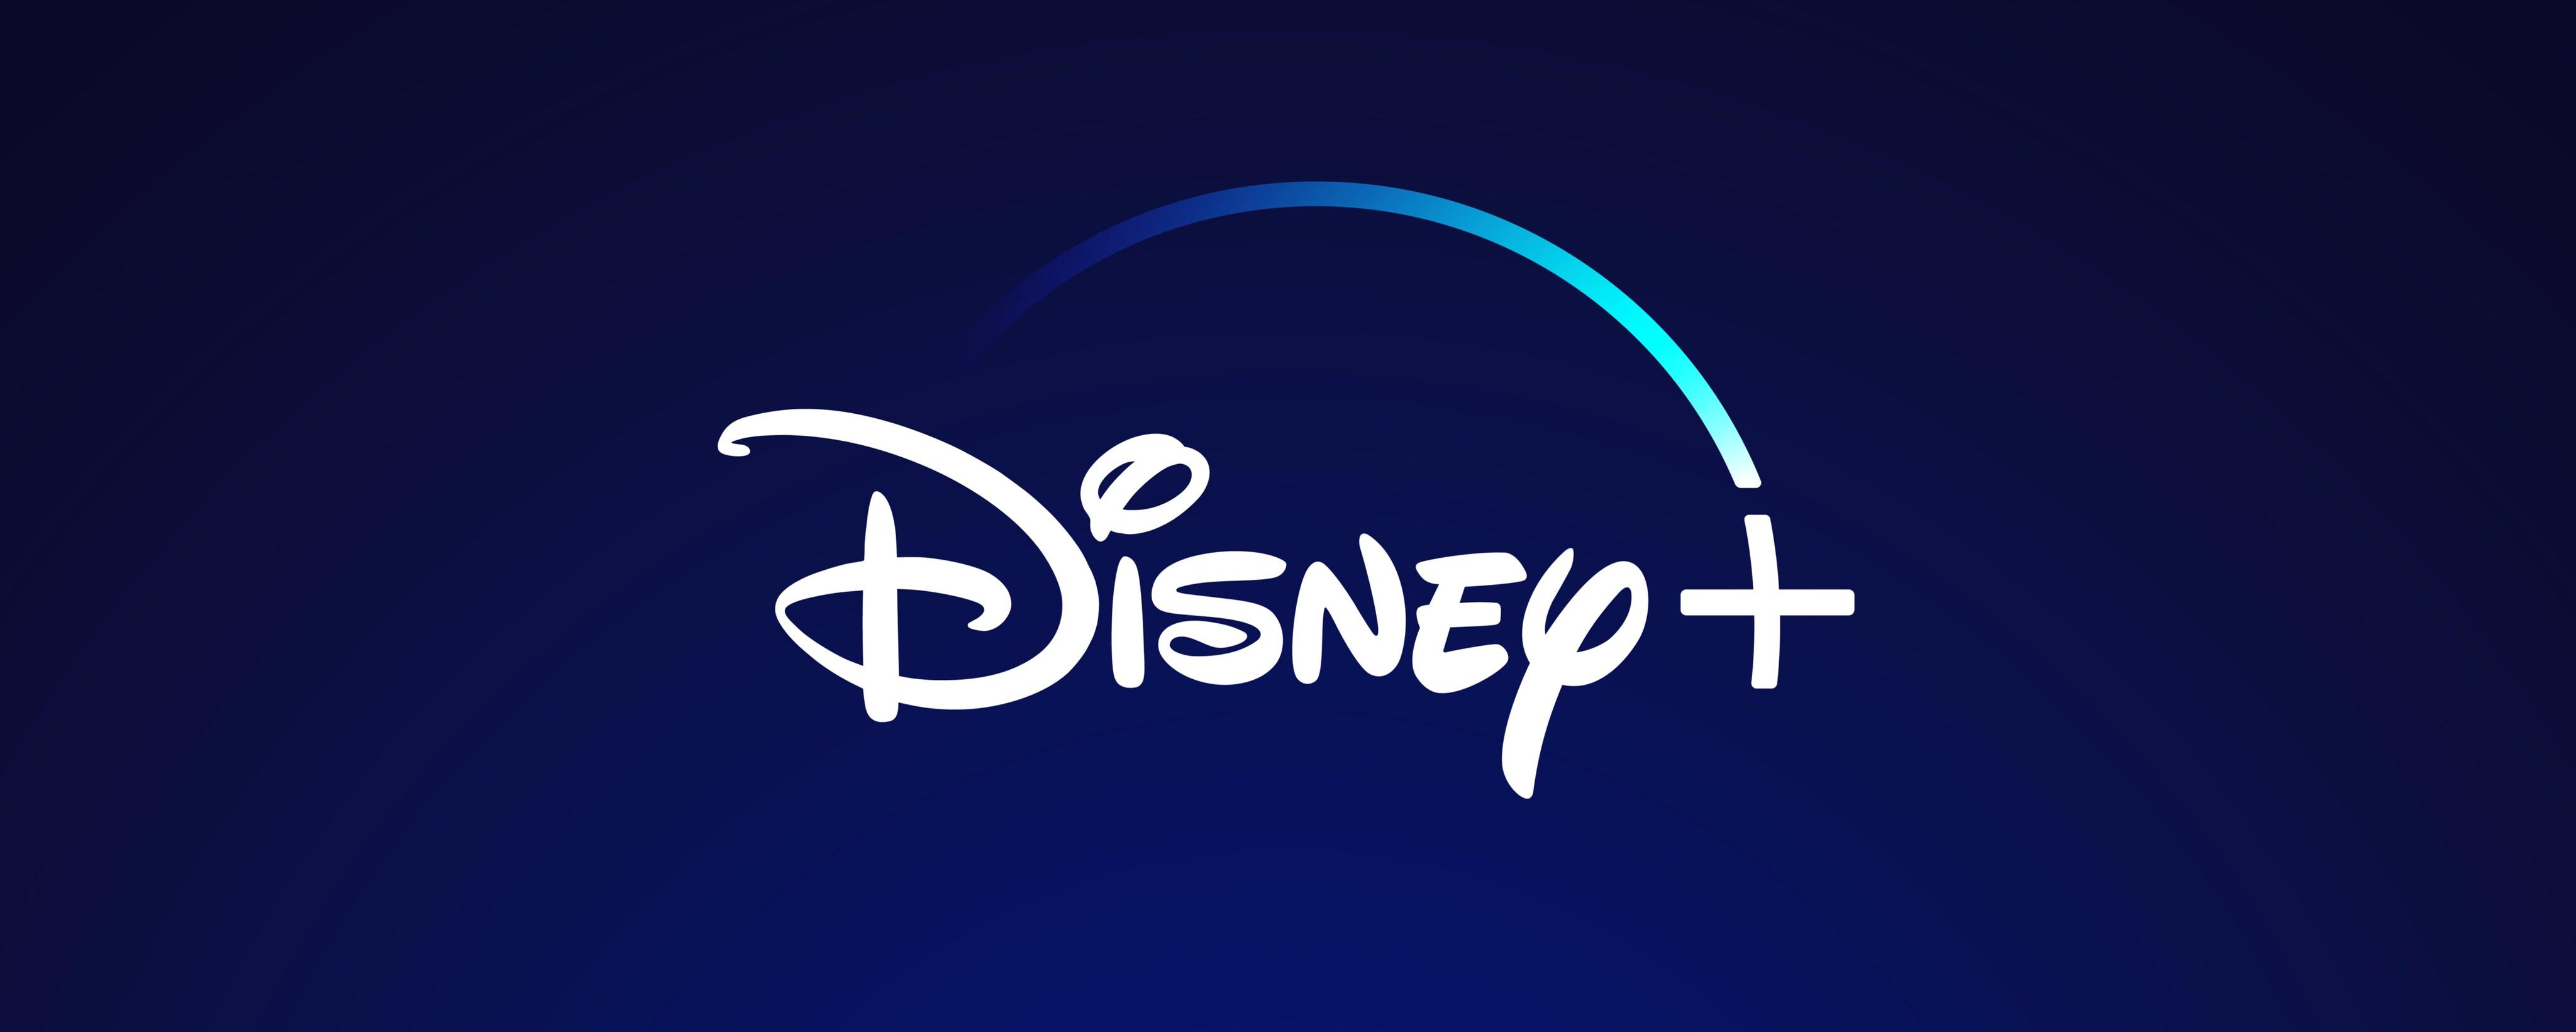 Next on Disney+: May 2020